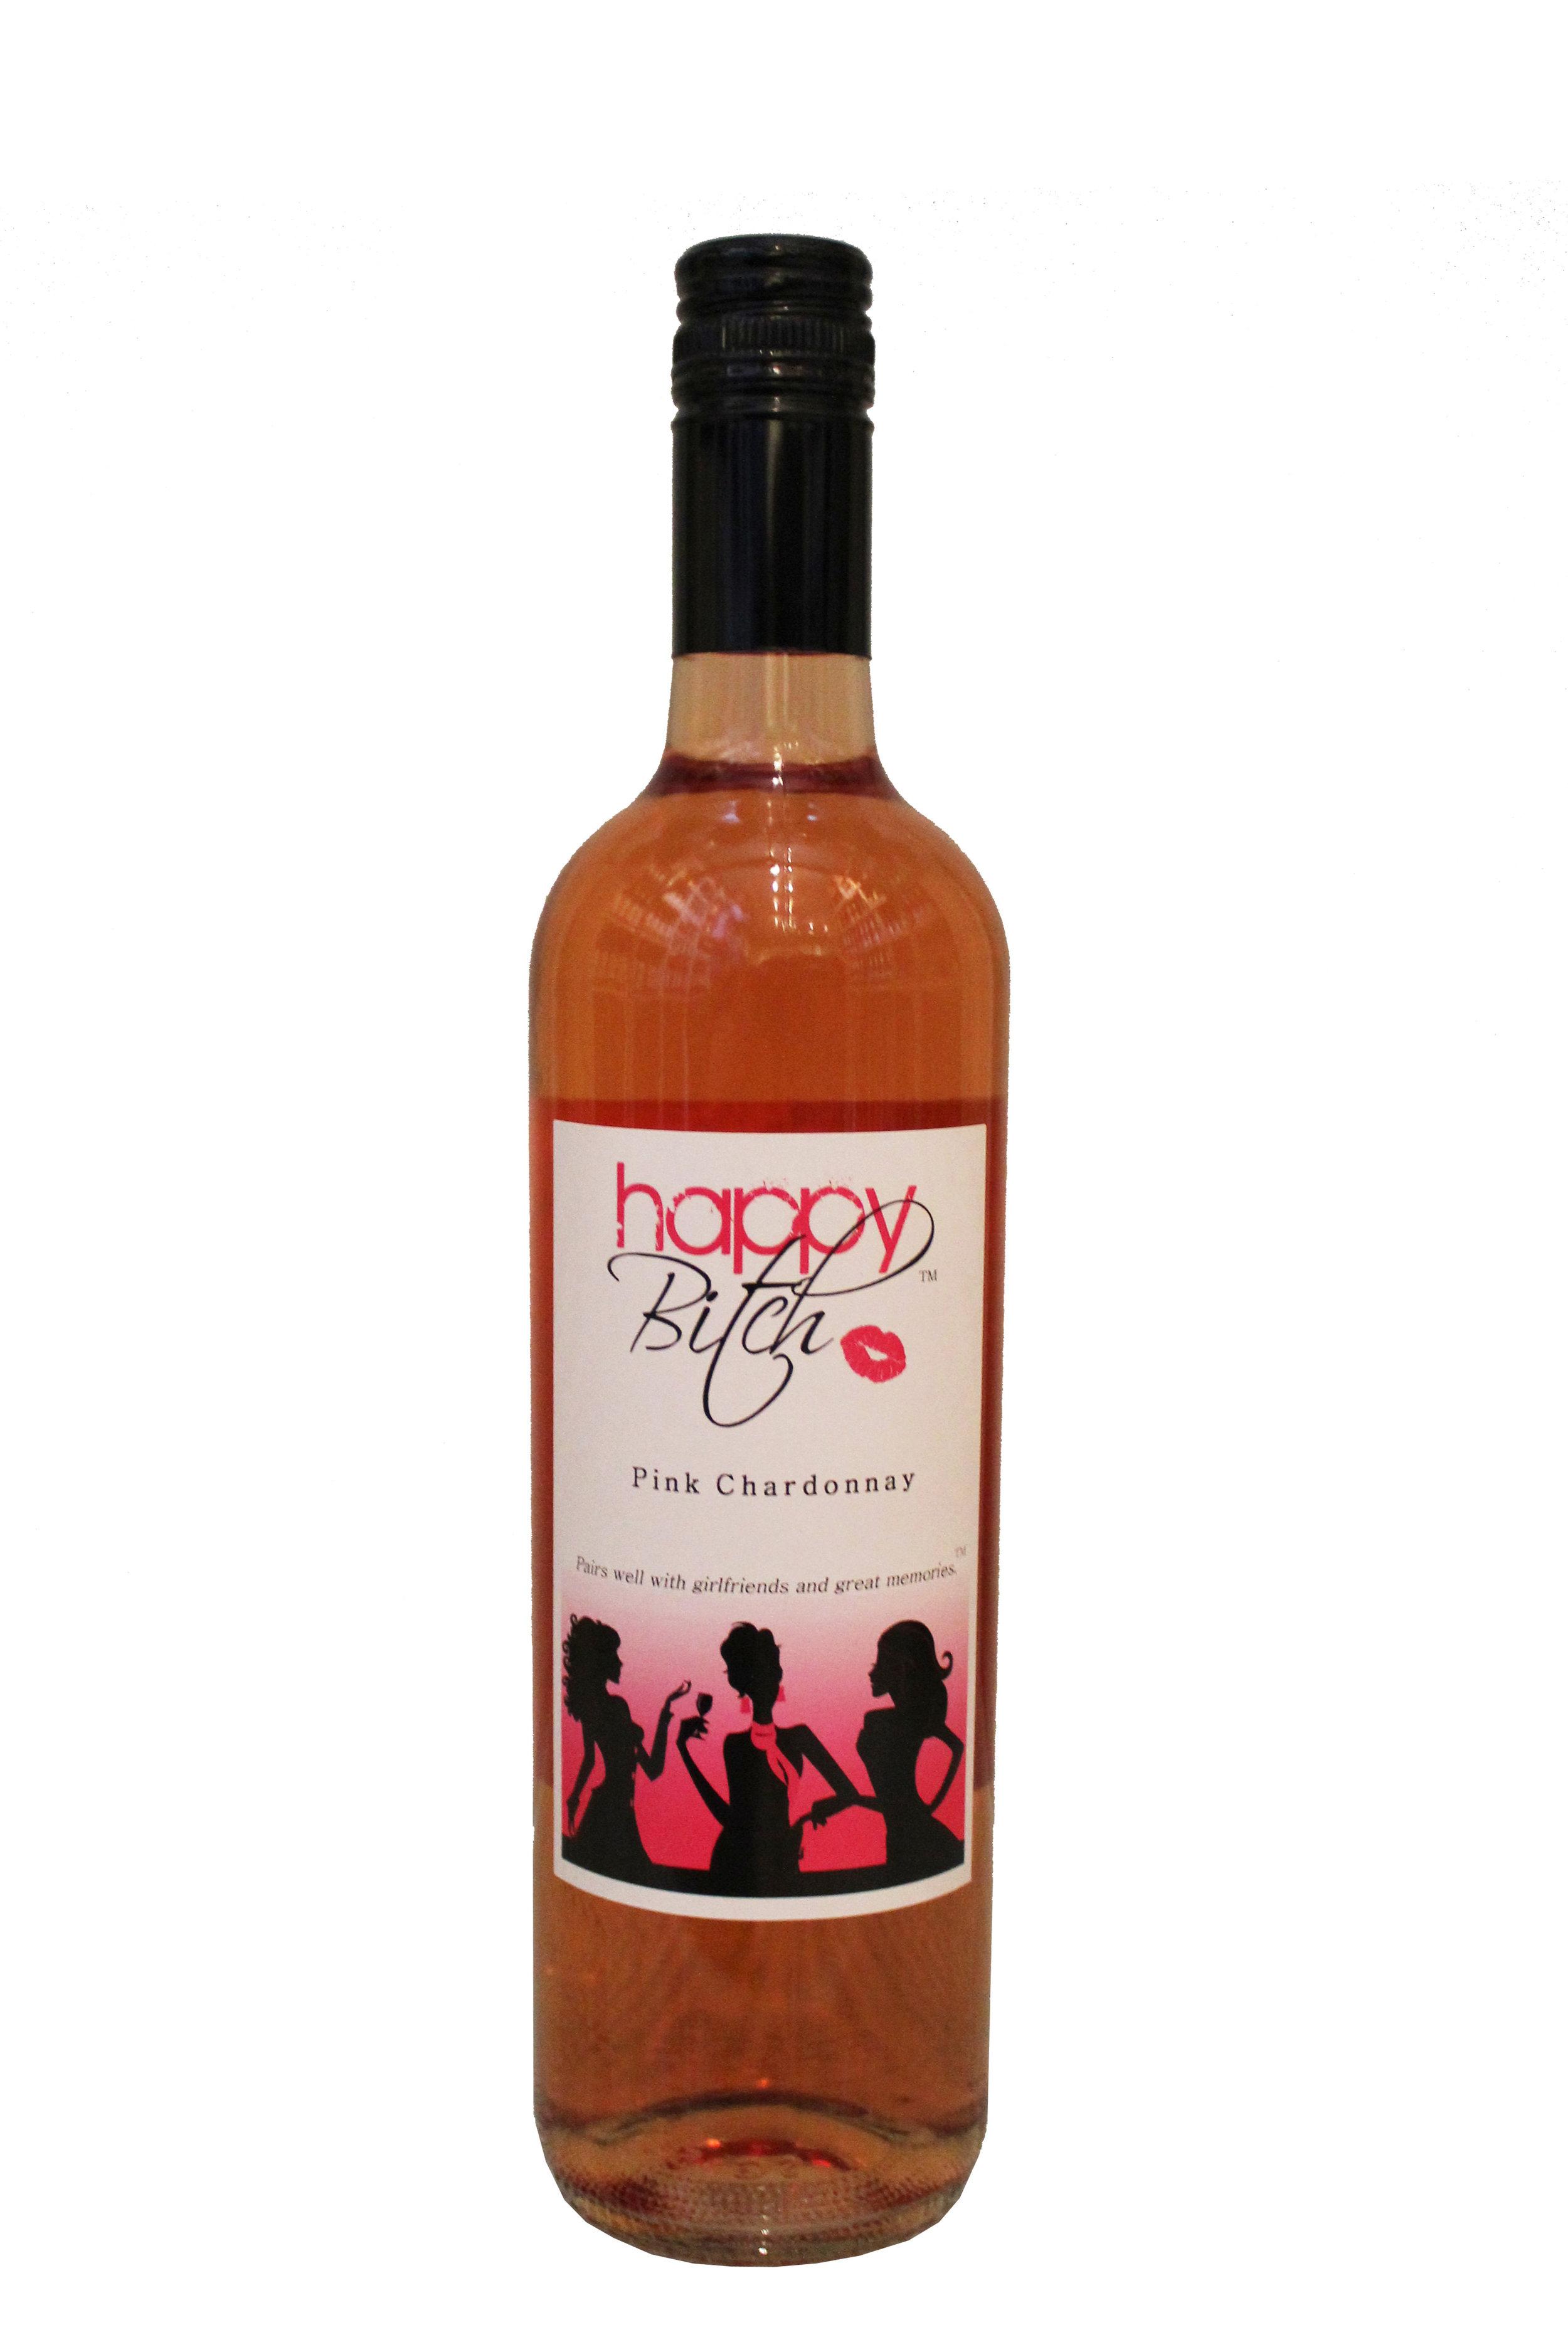 Pink Chardonnay  Happy Bitch, New York